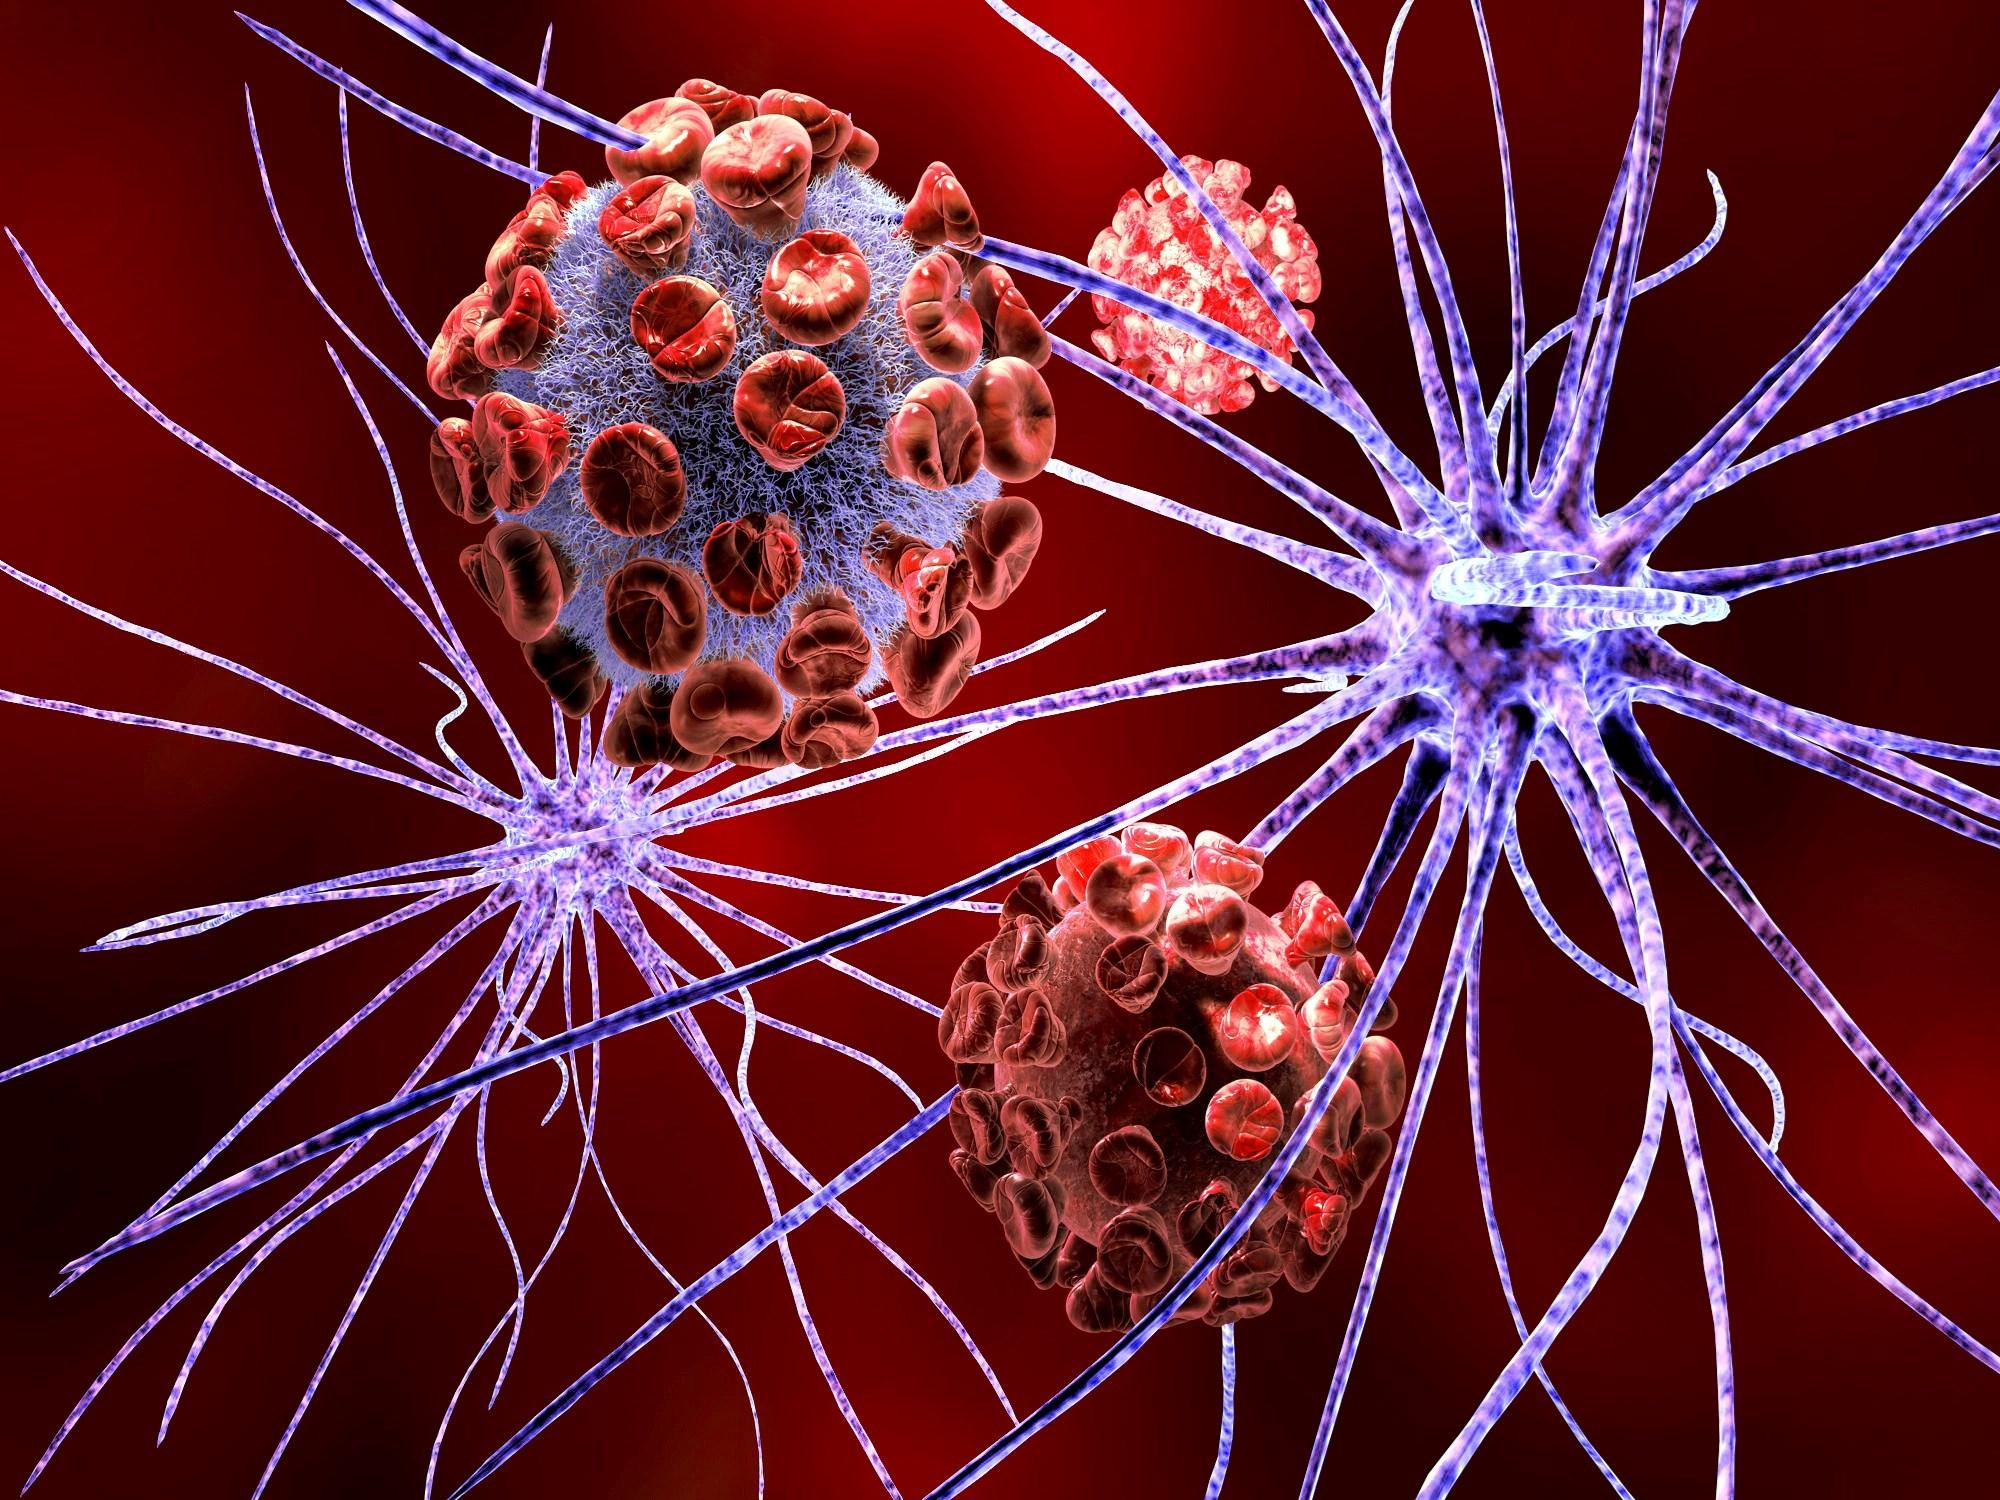 Herpesvirus Abundant in Alzheimer Disease Brain, New Study Finds